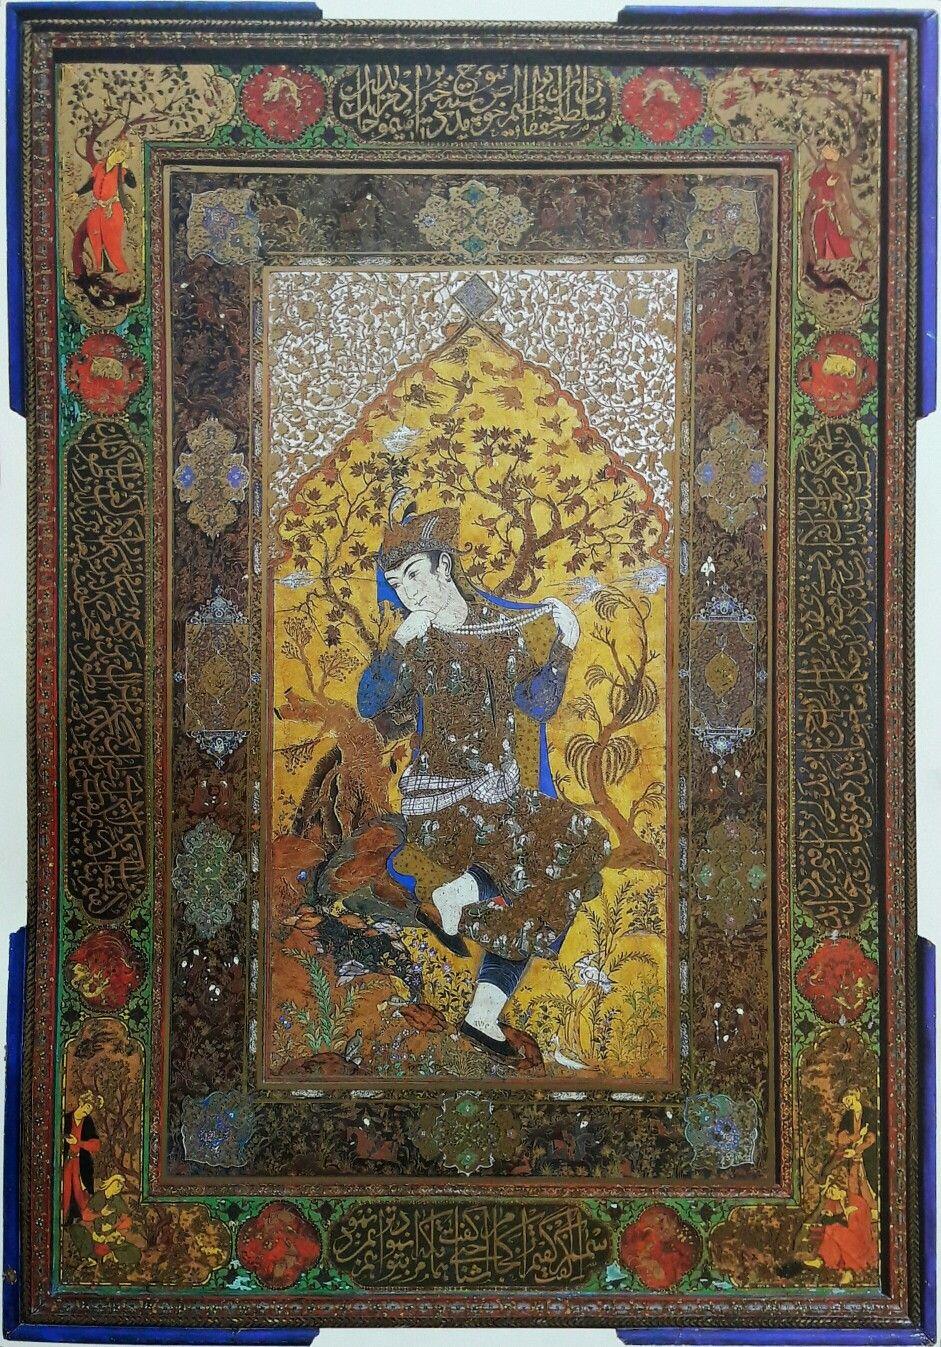 مرقع سوخت اثر میرزا آقا امامی (With images) Persian